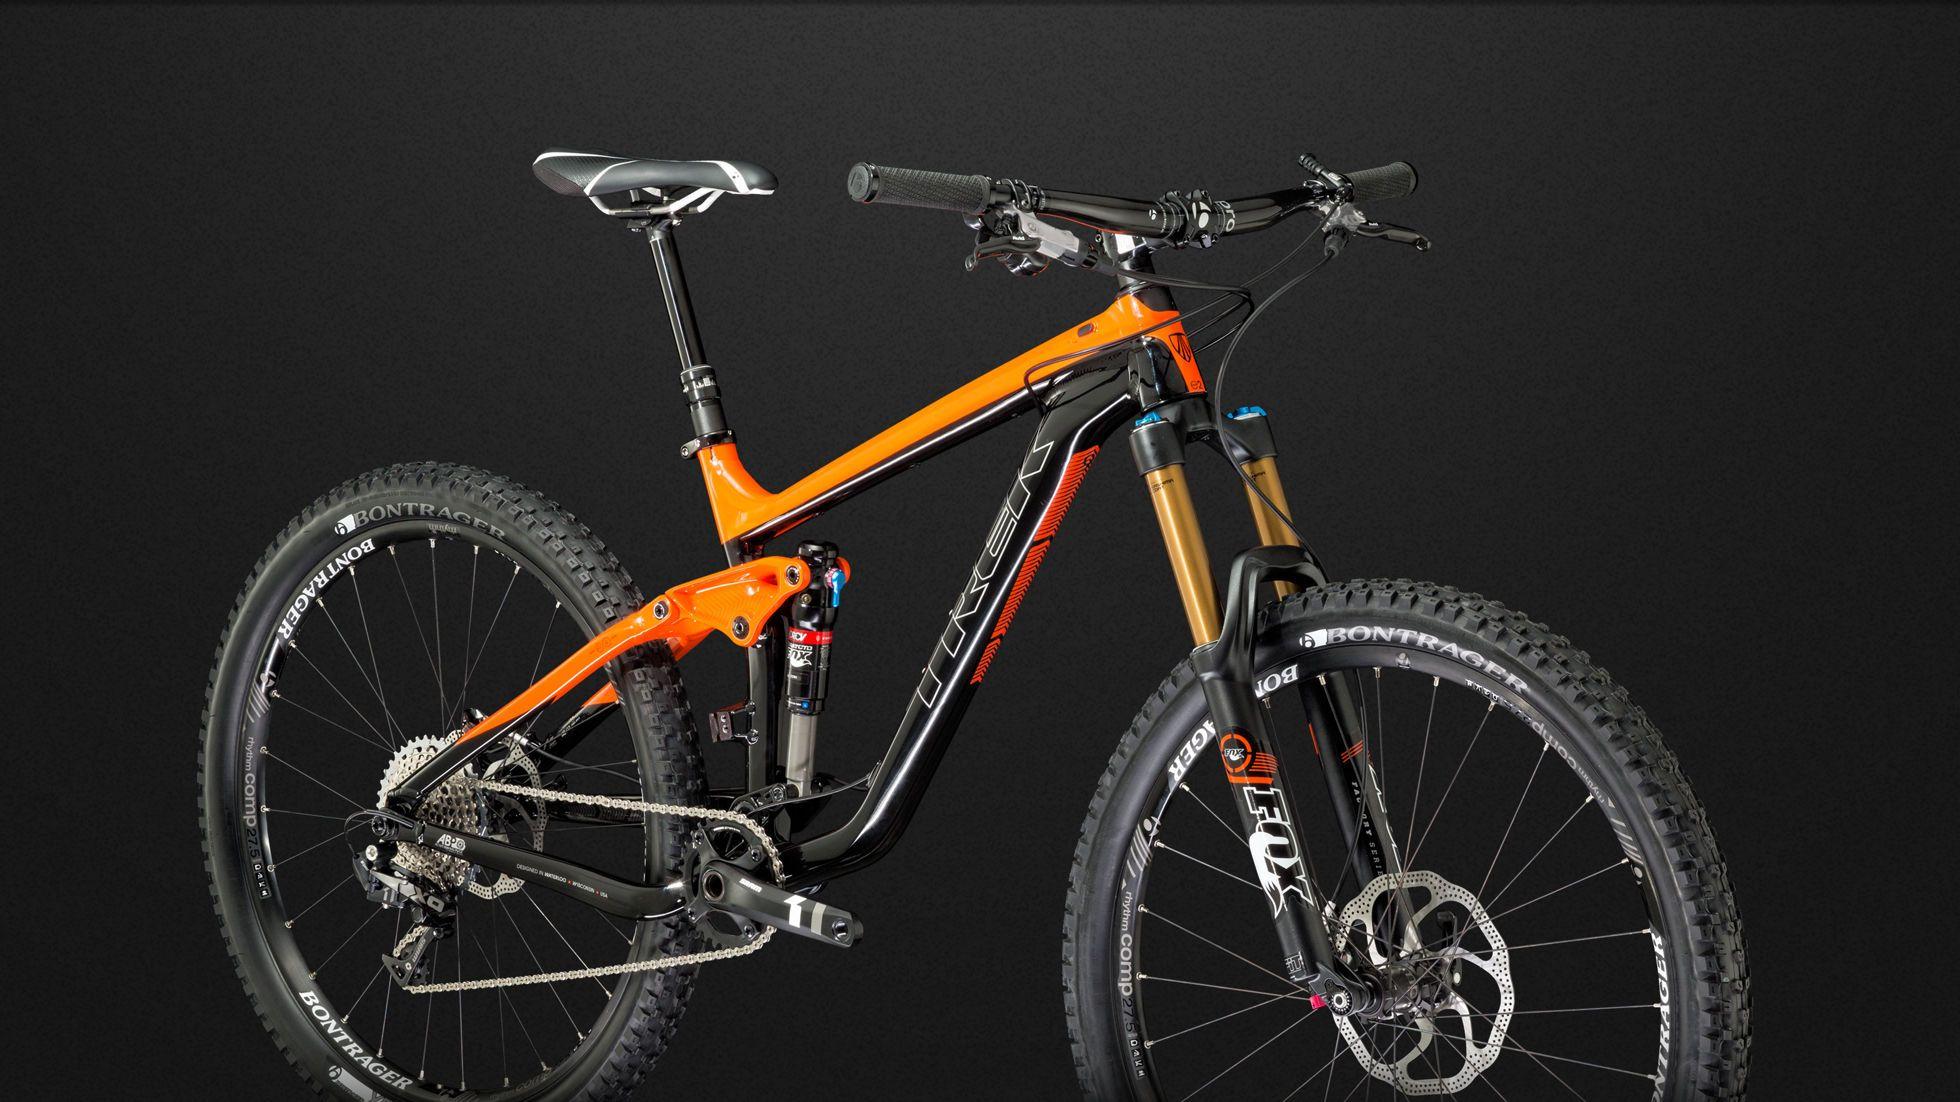 Slash 9 27 5 650b Trek Bicycle Trek Bicycle Trek Bikes